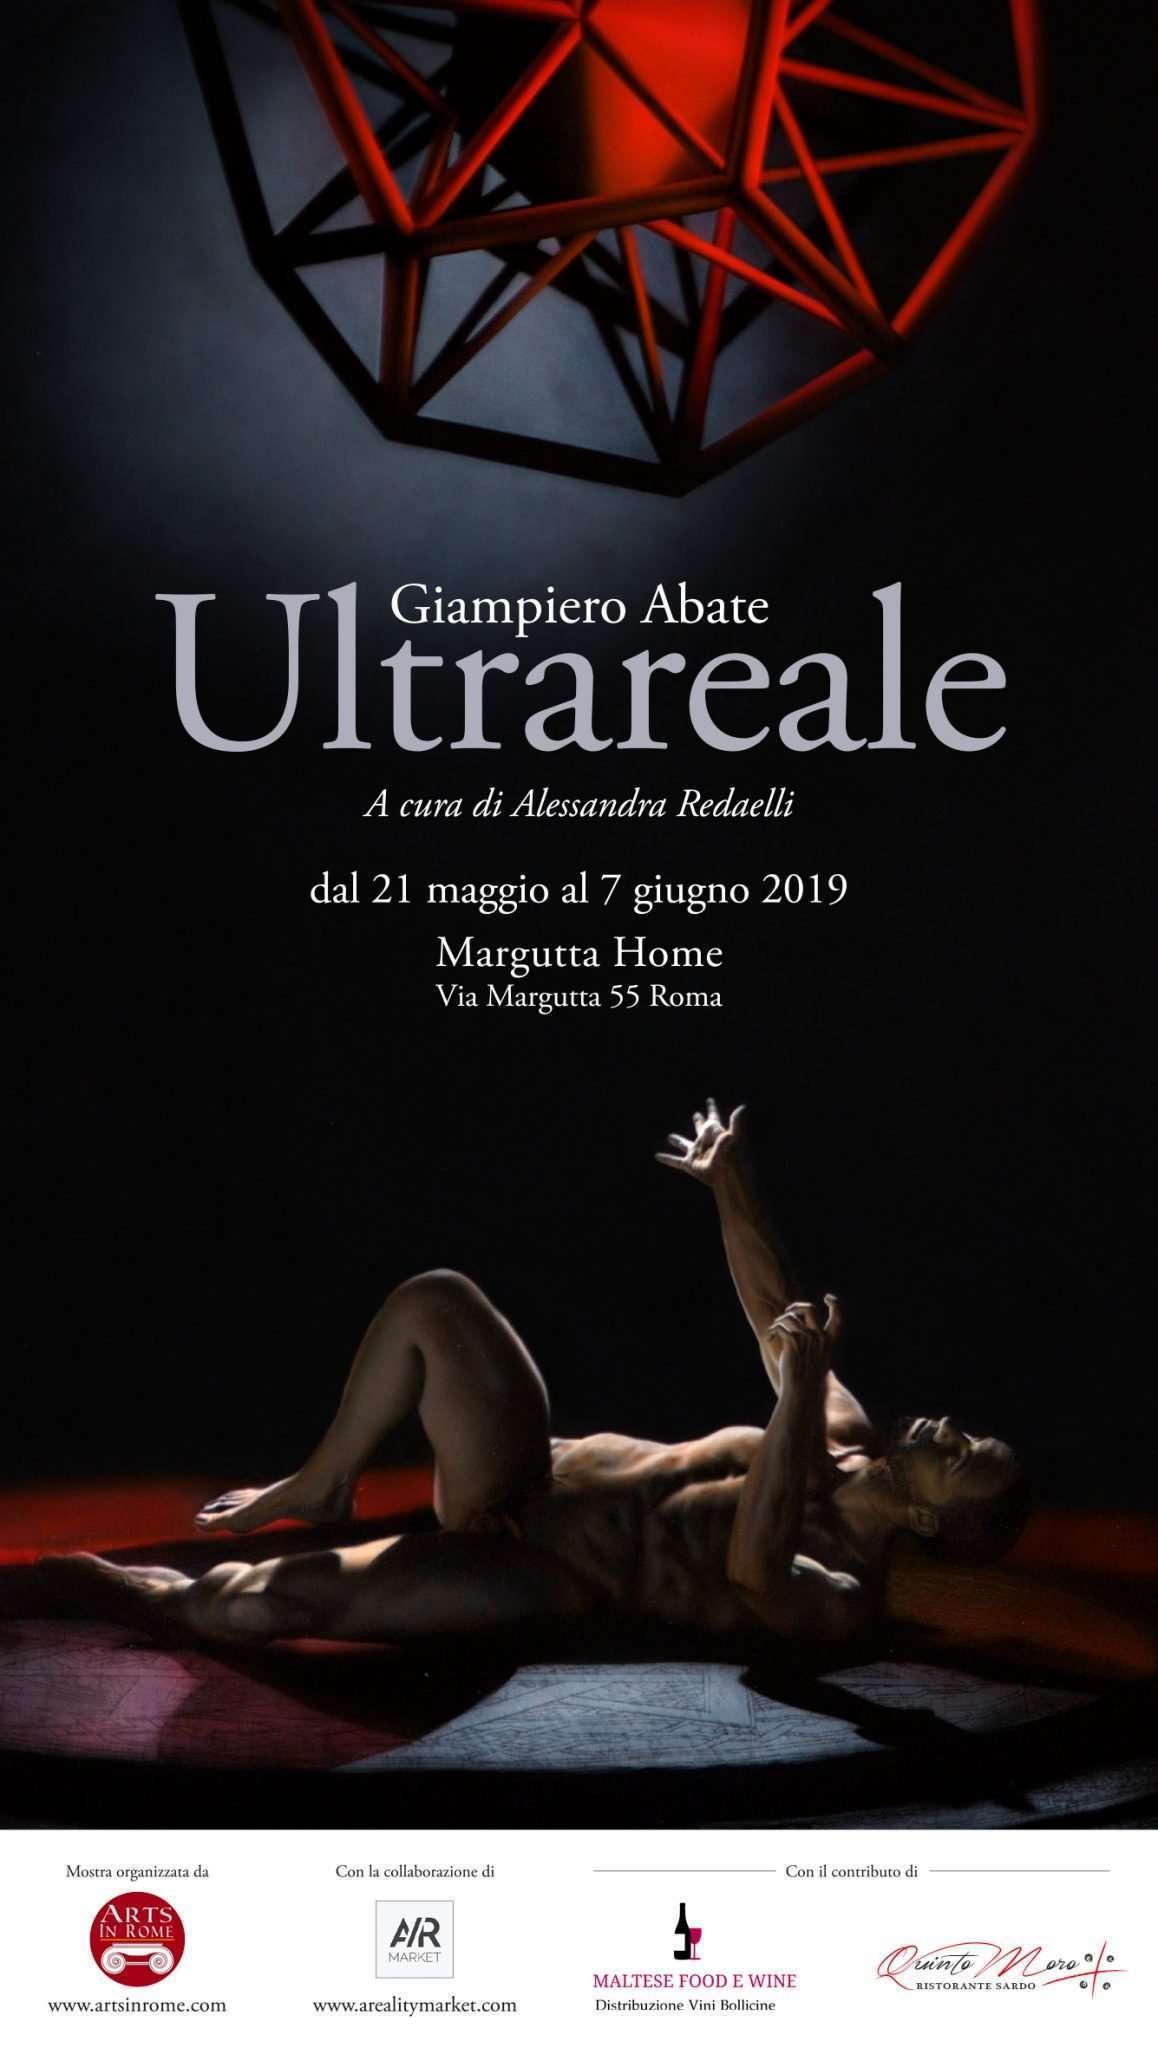 Ultrareale - mostra di Giampiero Abate